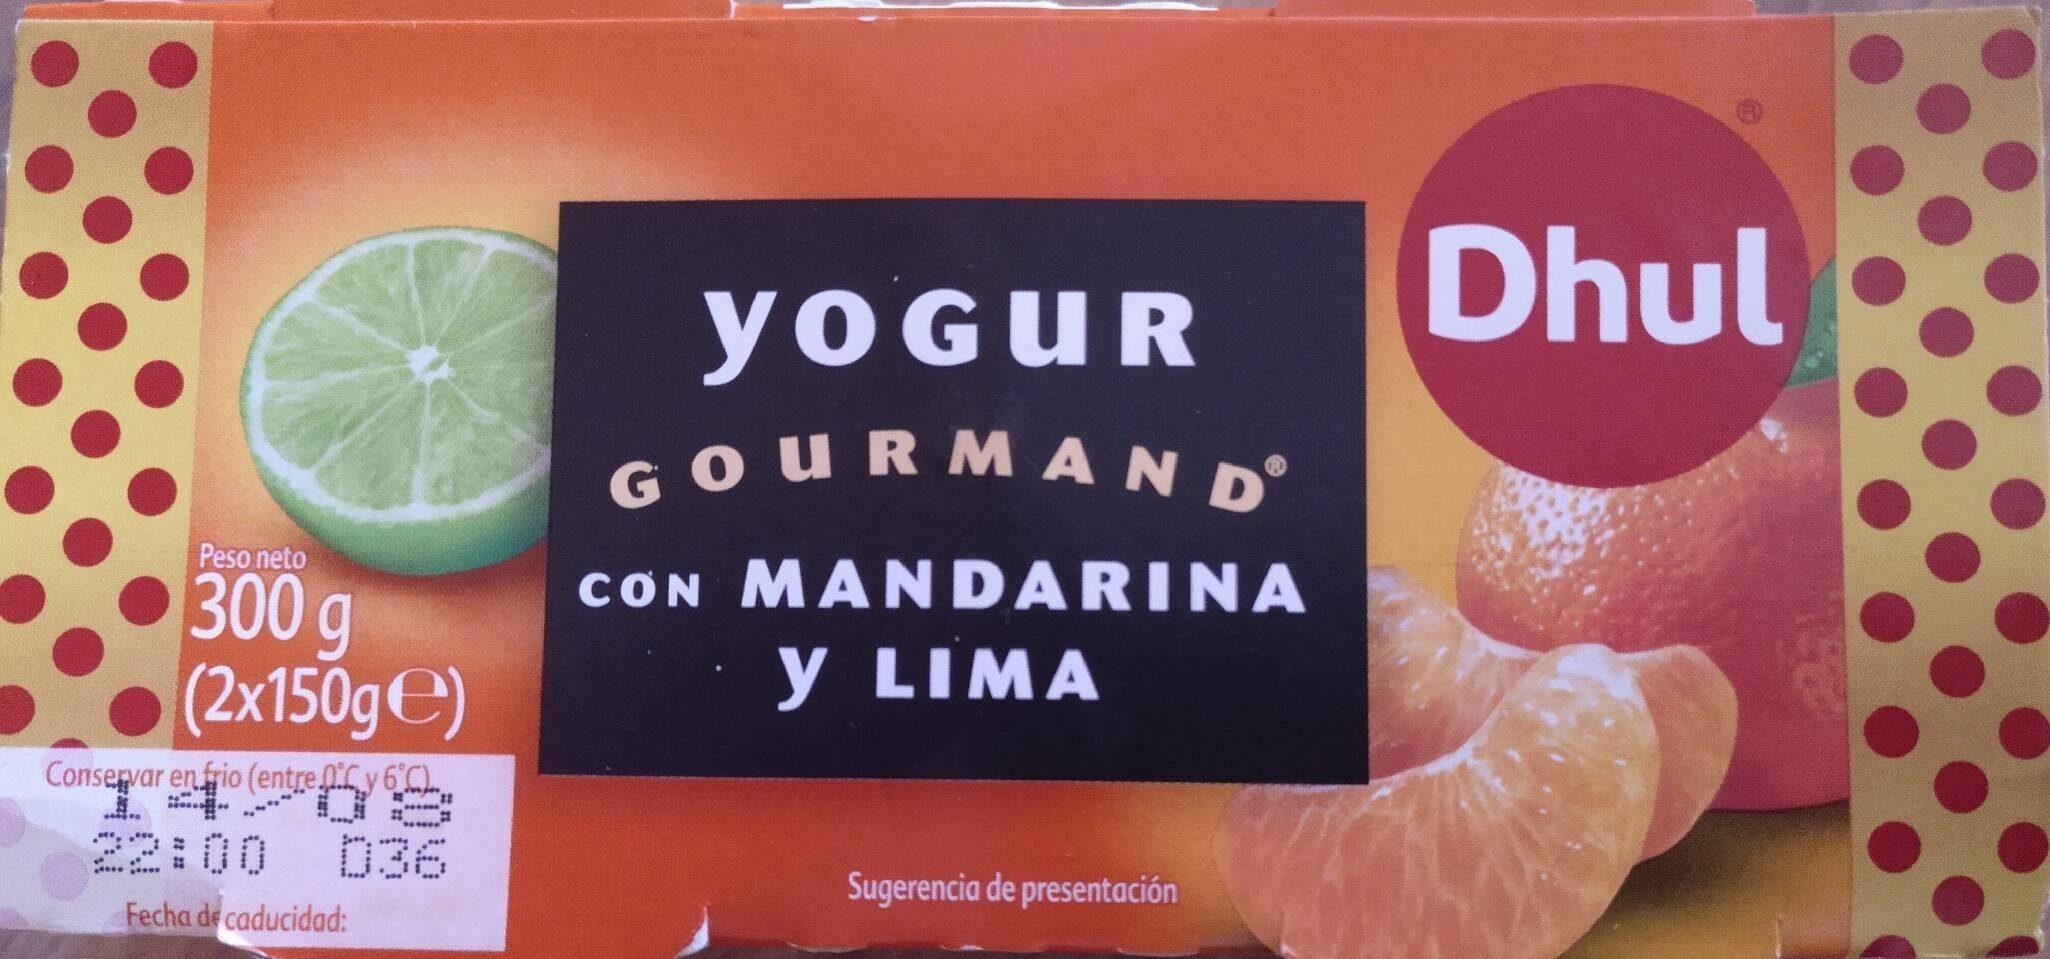 Yogur GOURMAND con mandarina y lima - Producto